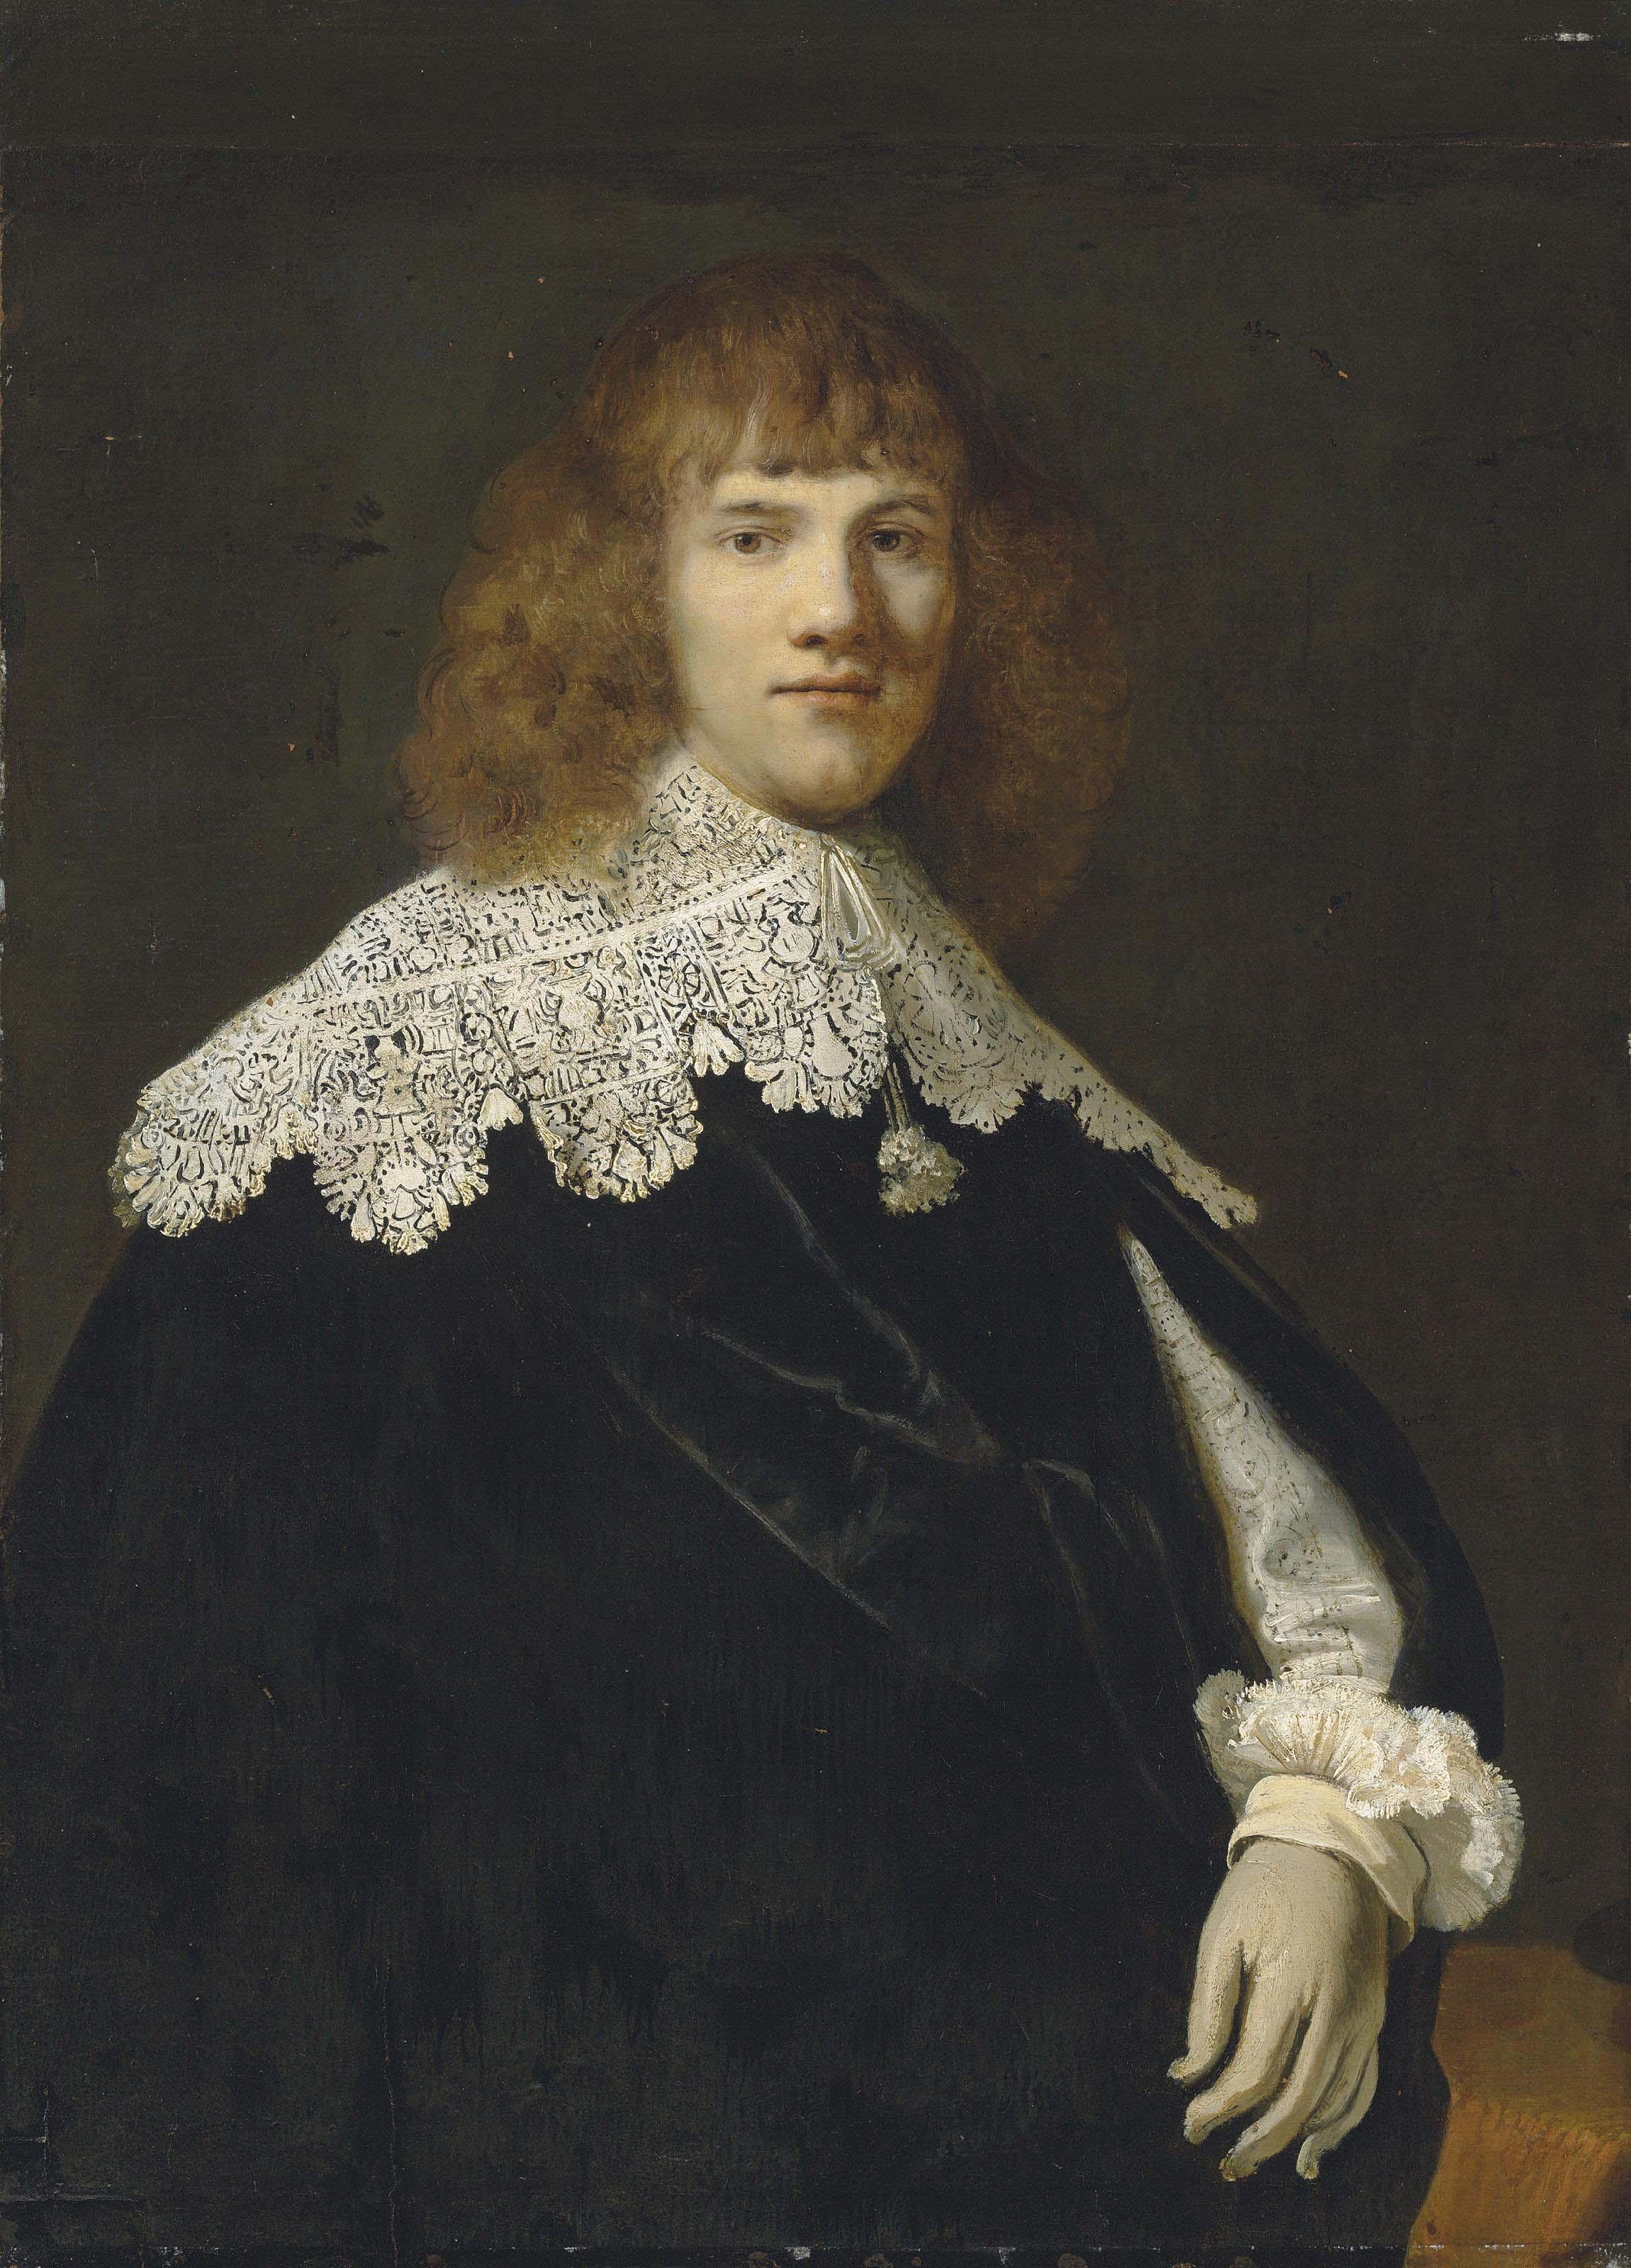 Circle of Rembrandt Harmensz. van Rijn (Leiden 1606-1669 Amsterdam)